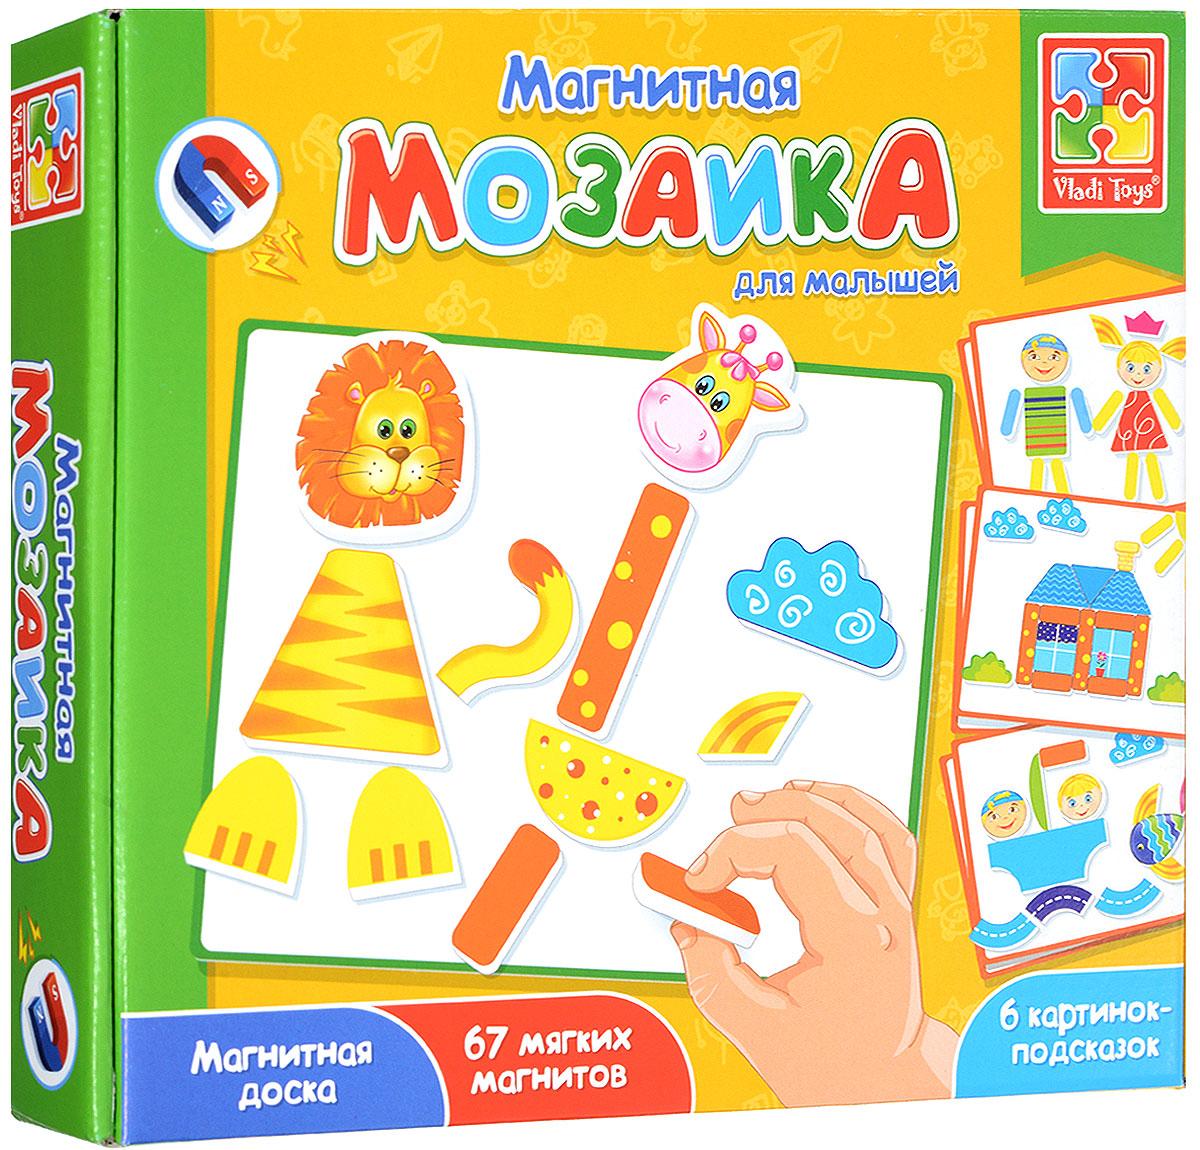 Vladi Toys Магнитная мозаика Львенок и Жираф мозаика vladi toys мозаика магнитная львенок и жираф 67 деталей